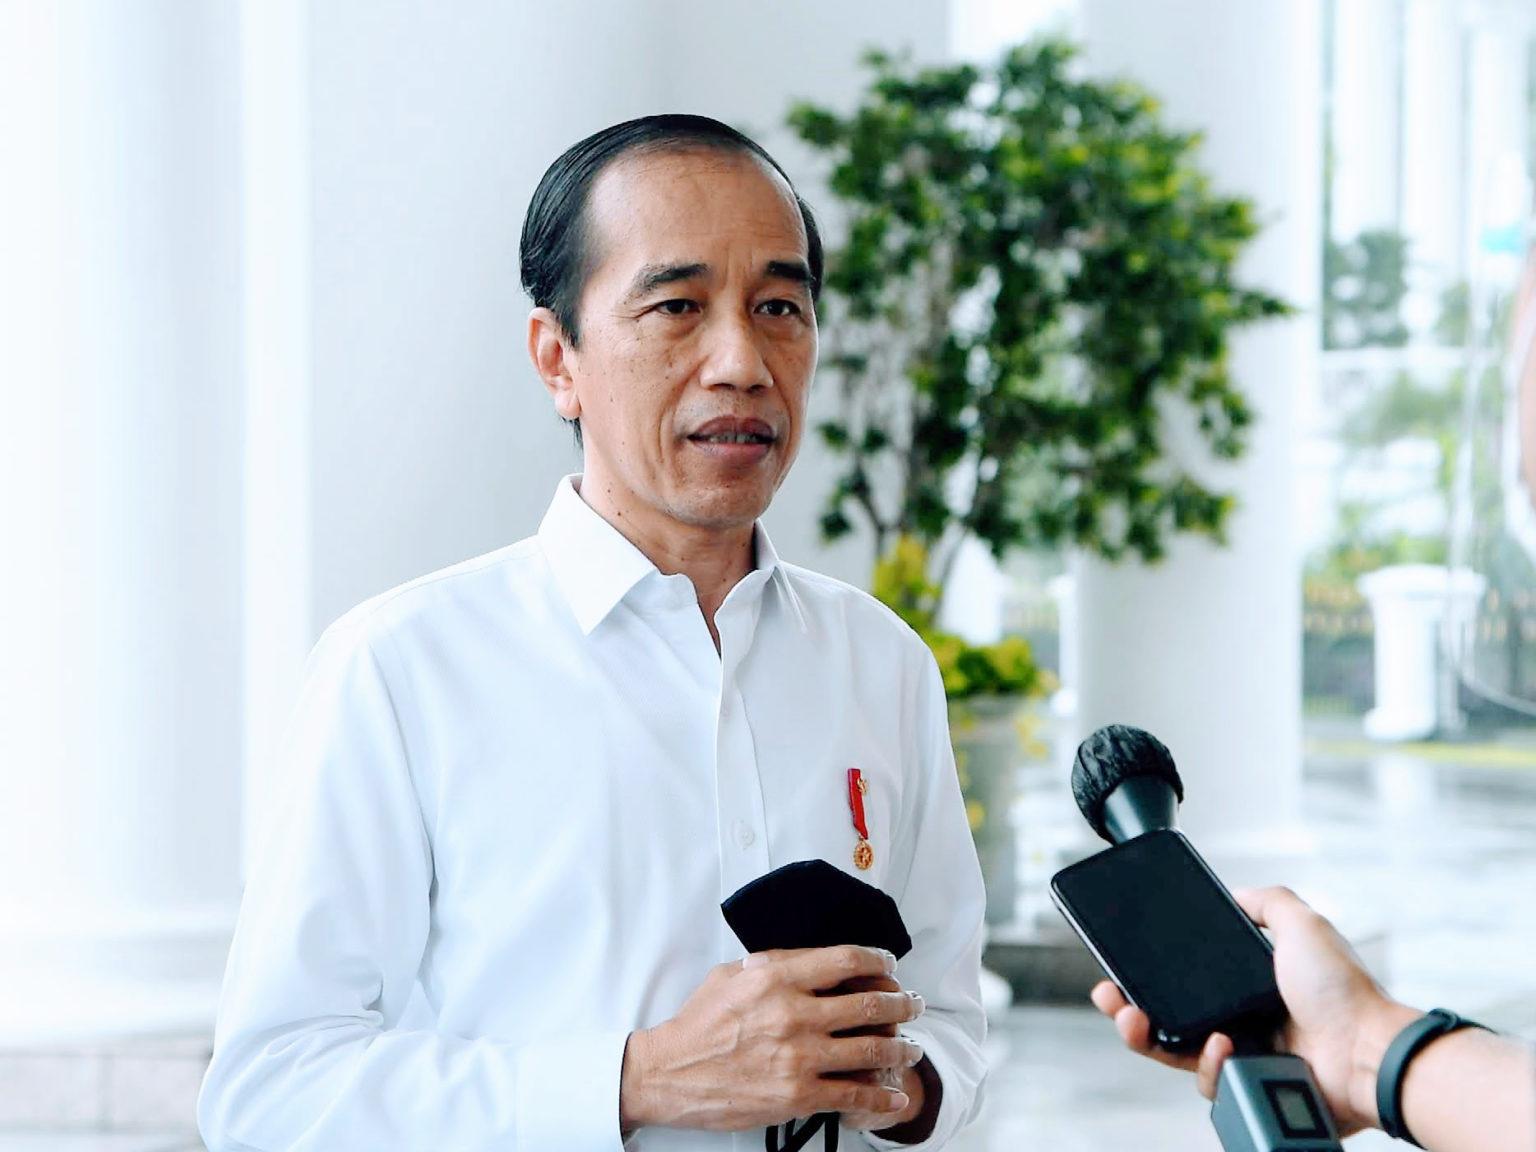 Presiden Jokowi Tegaskan Tidak Lindungi Pejabat Korupsi